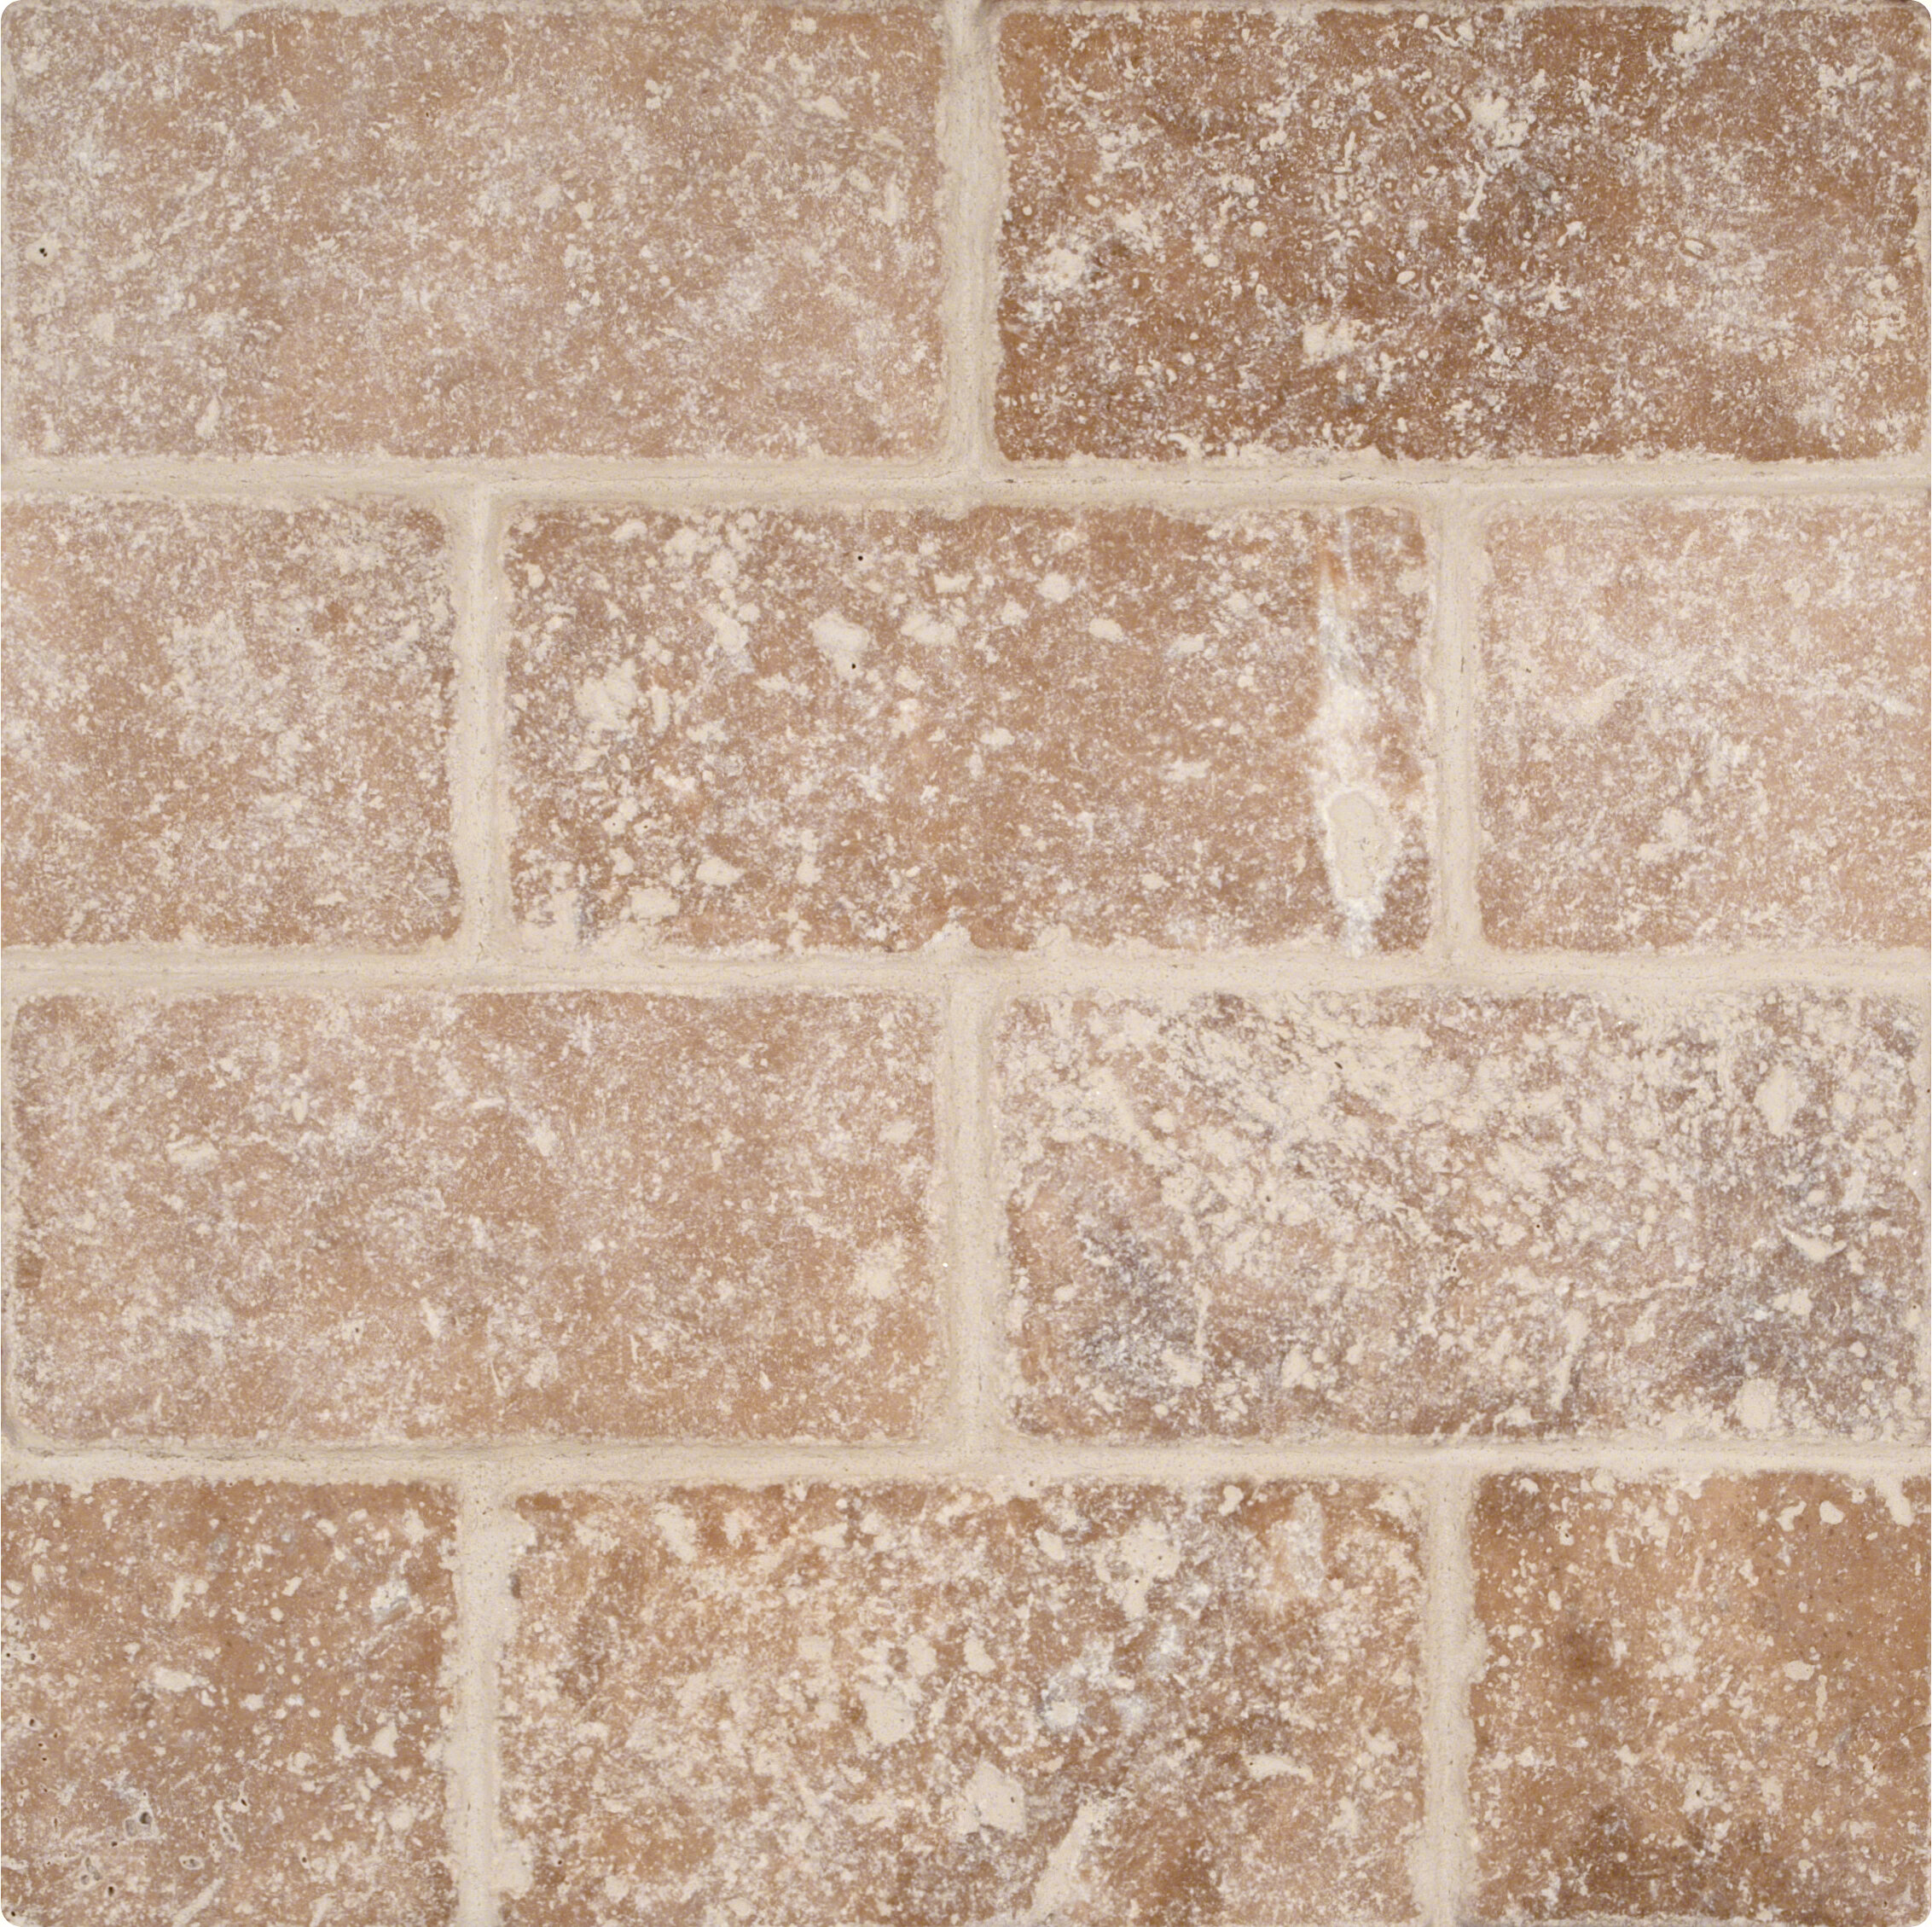 Msi Tuscany Walnut 3 X 6 Travertine Subway Tile In Tumbled Brown Reviews Wayfair